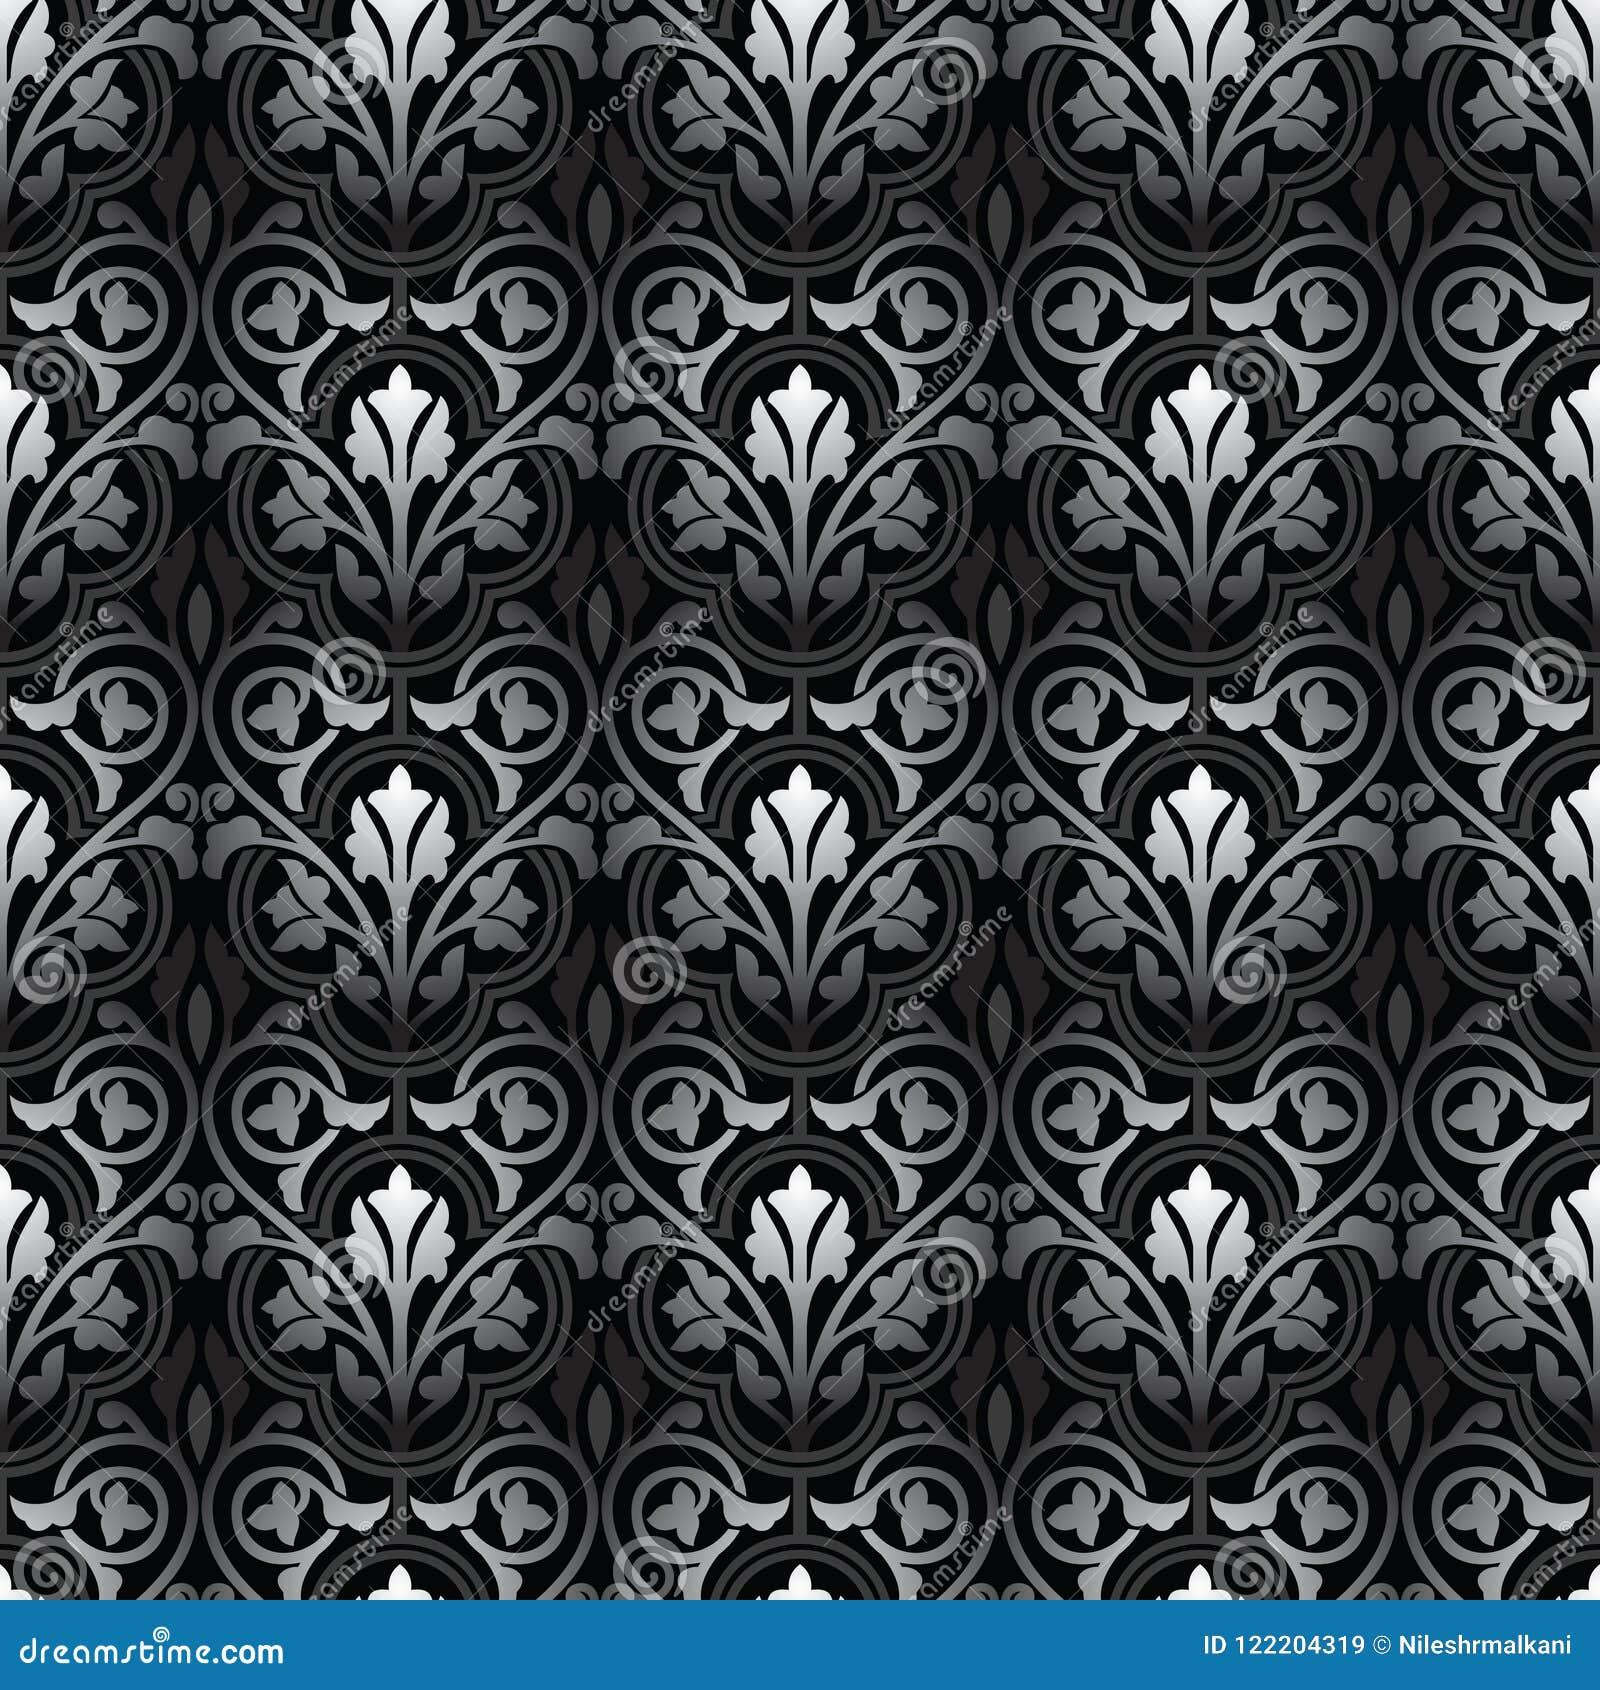 Damask Seamless Floral Wallpaper Stock Vector Illustration Of